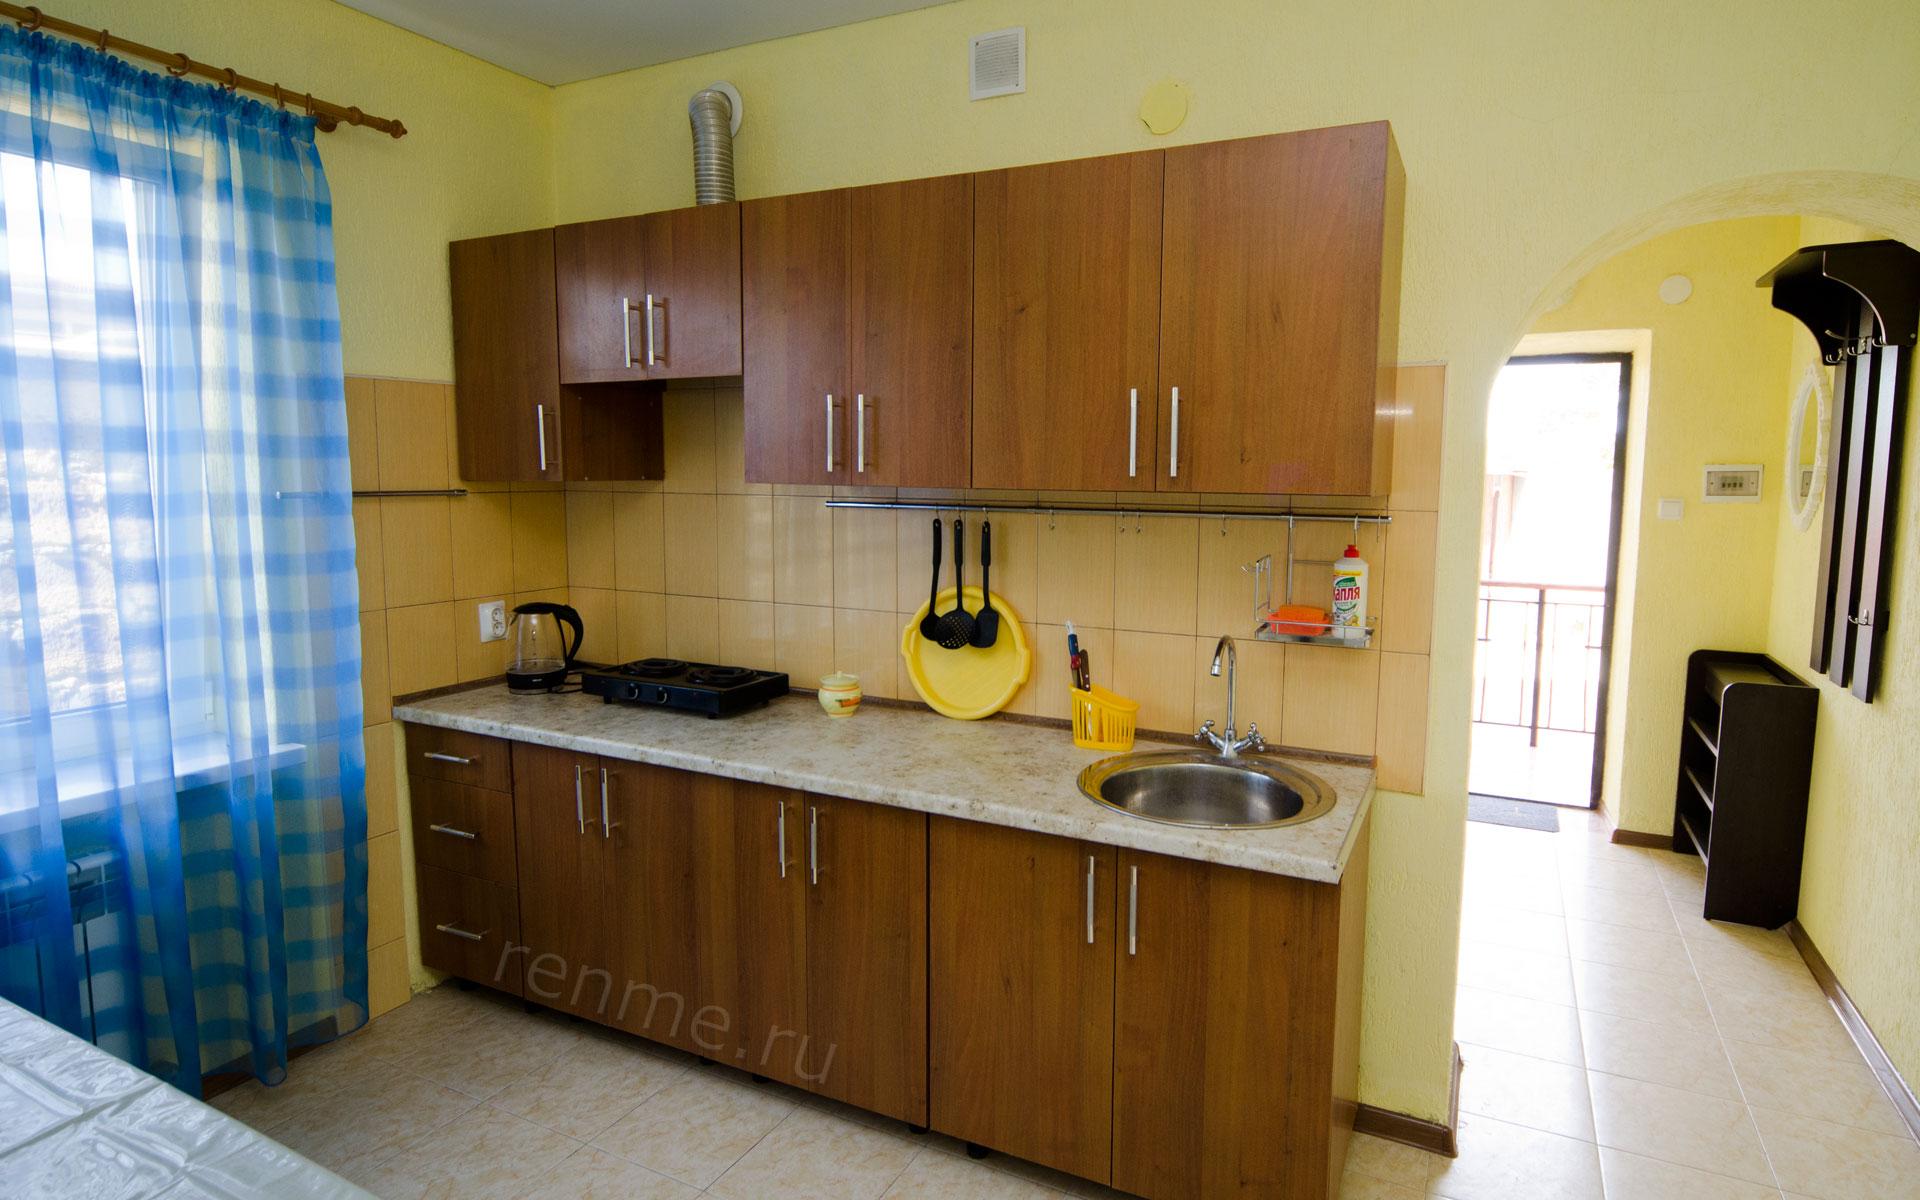 Кухня. Однокомнатная квартира. Апарт-отель на ул. Гайдара. Заозёрное